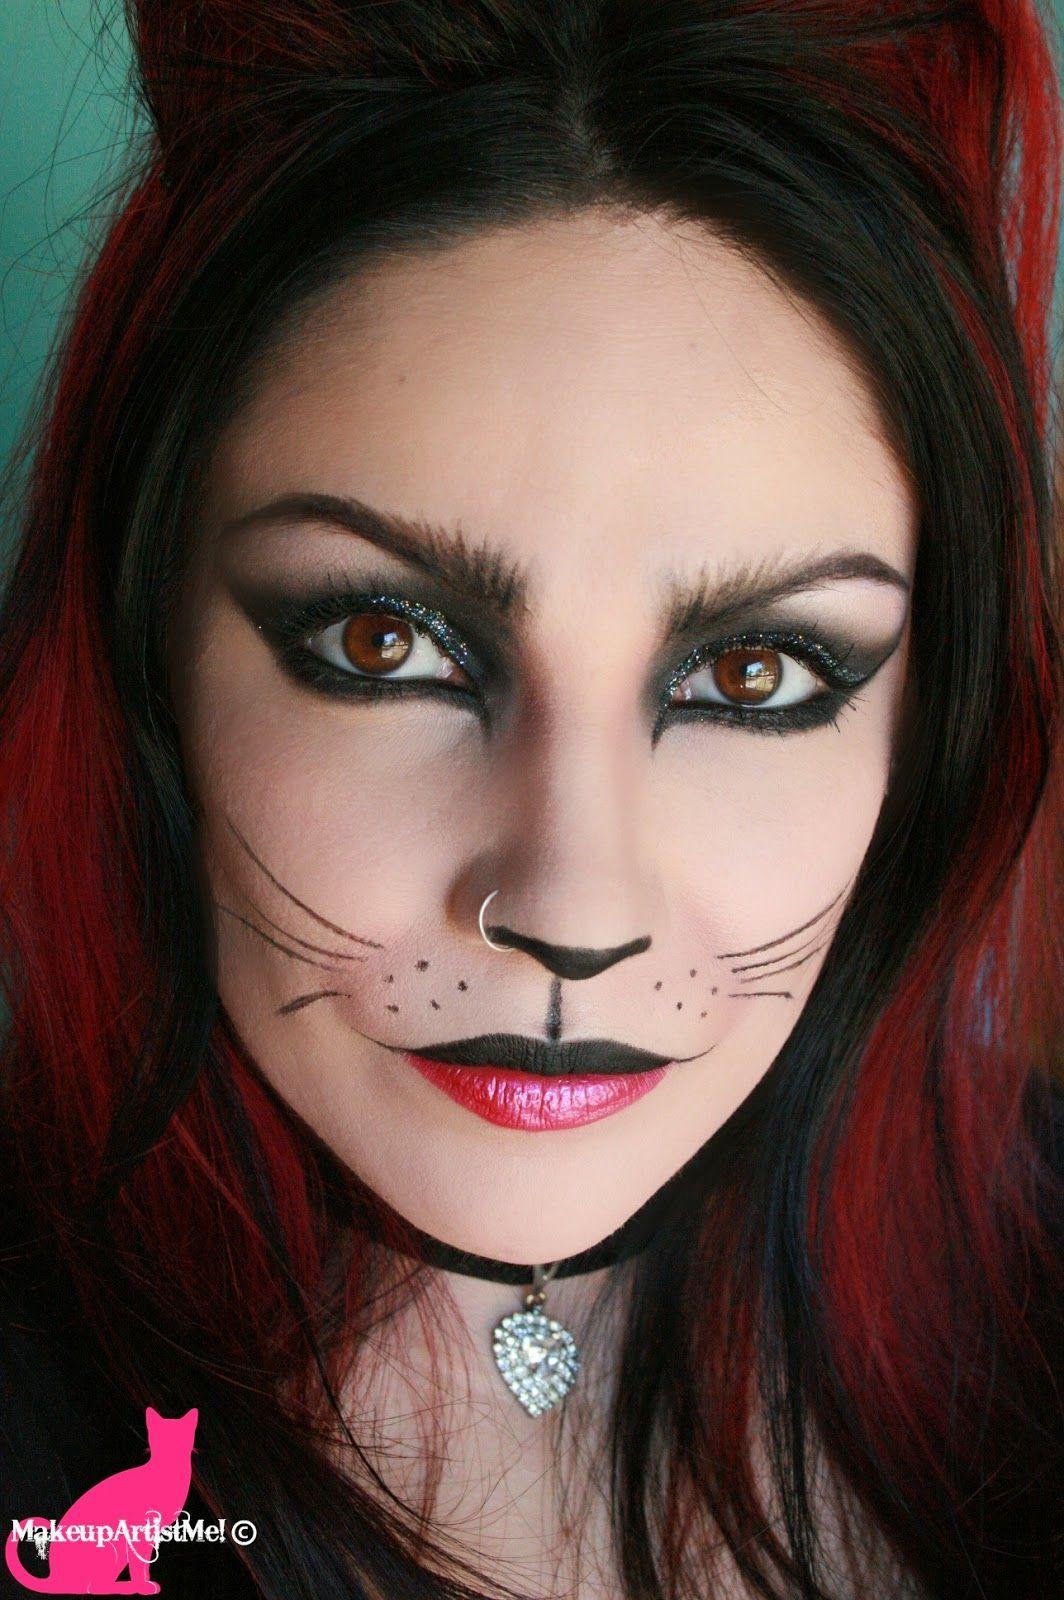 Make-up Artist Me!: Felina - Cat Costume Makeup Tutorial ...